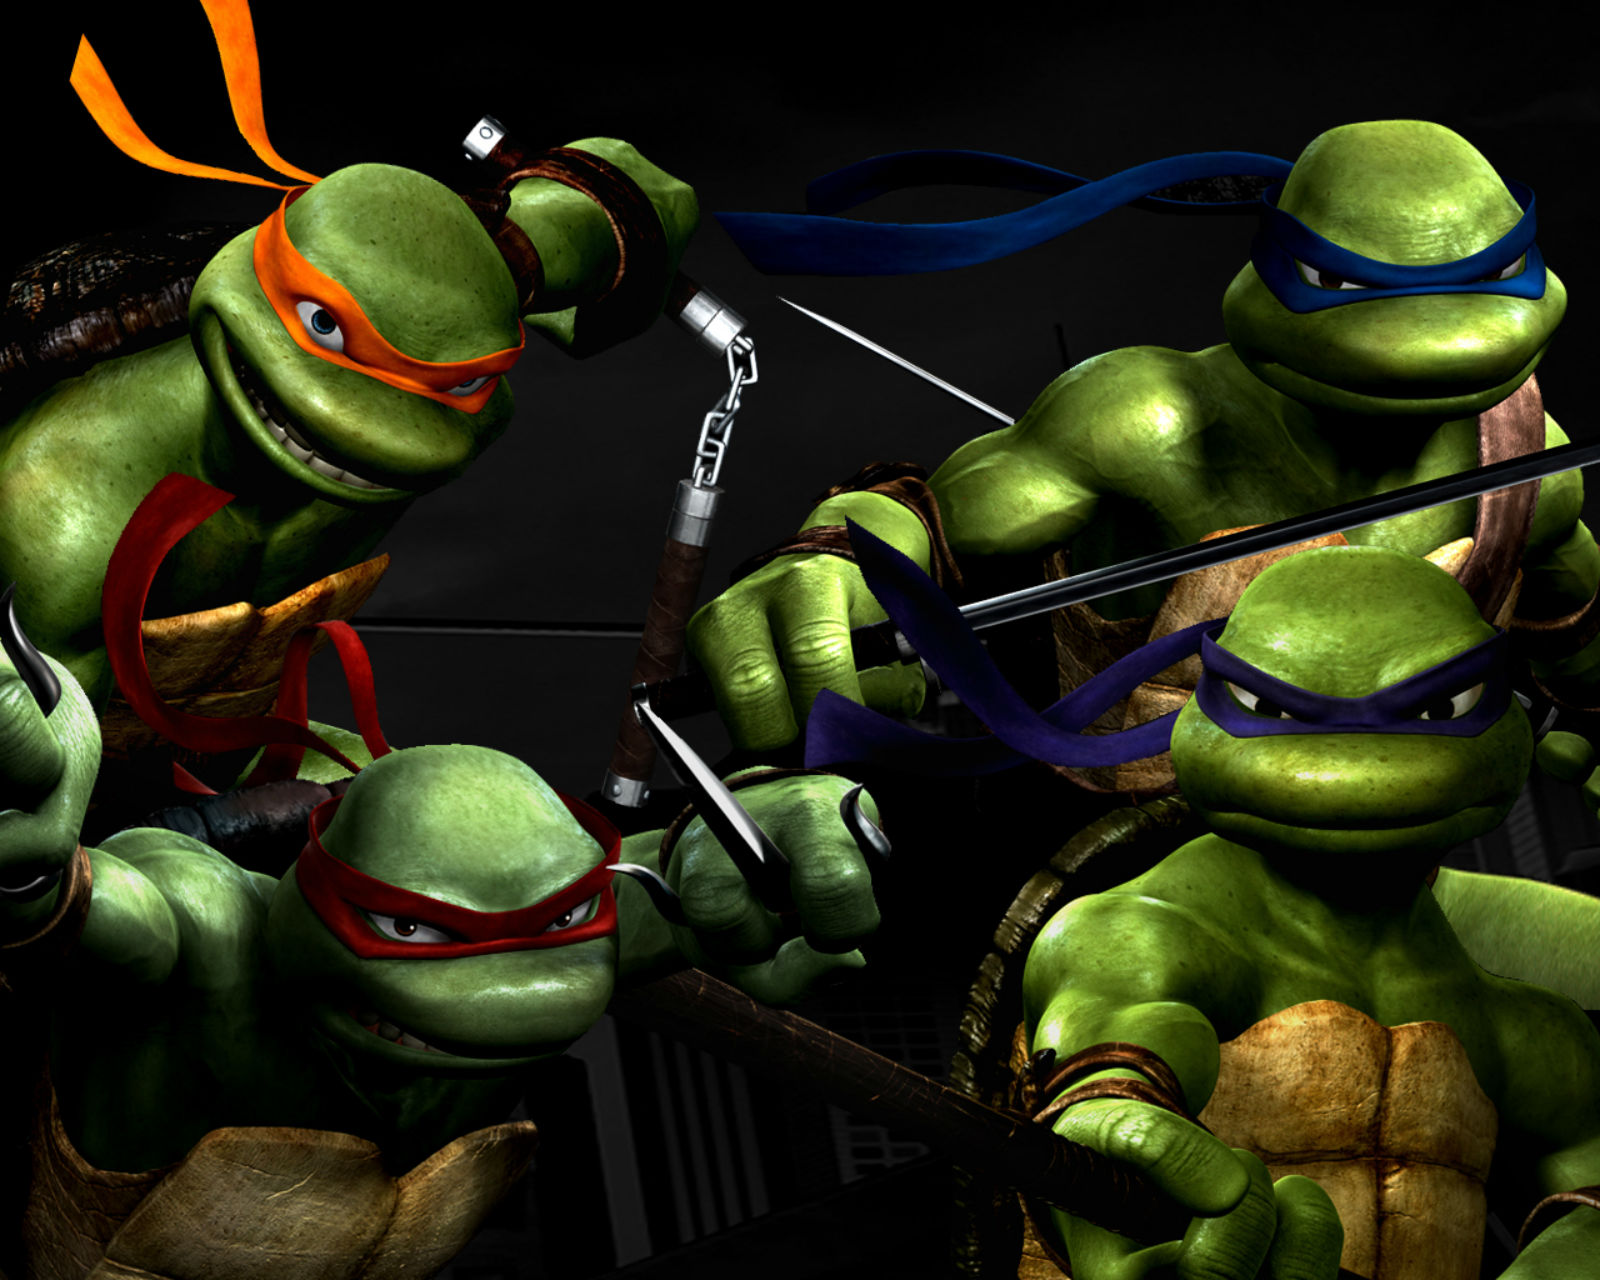 Ninja turtles screensavers and wallpapers wallpapersafari - Ninja turtles wallpaper ...